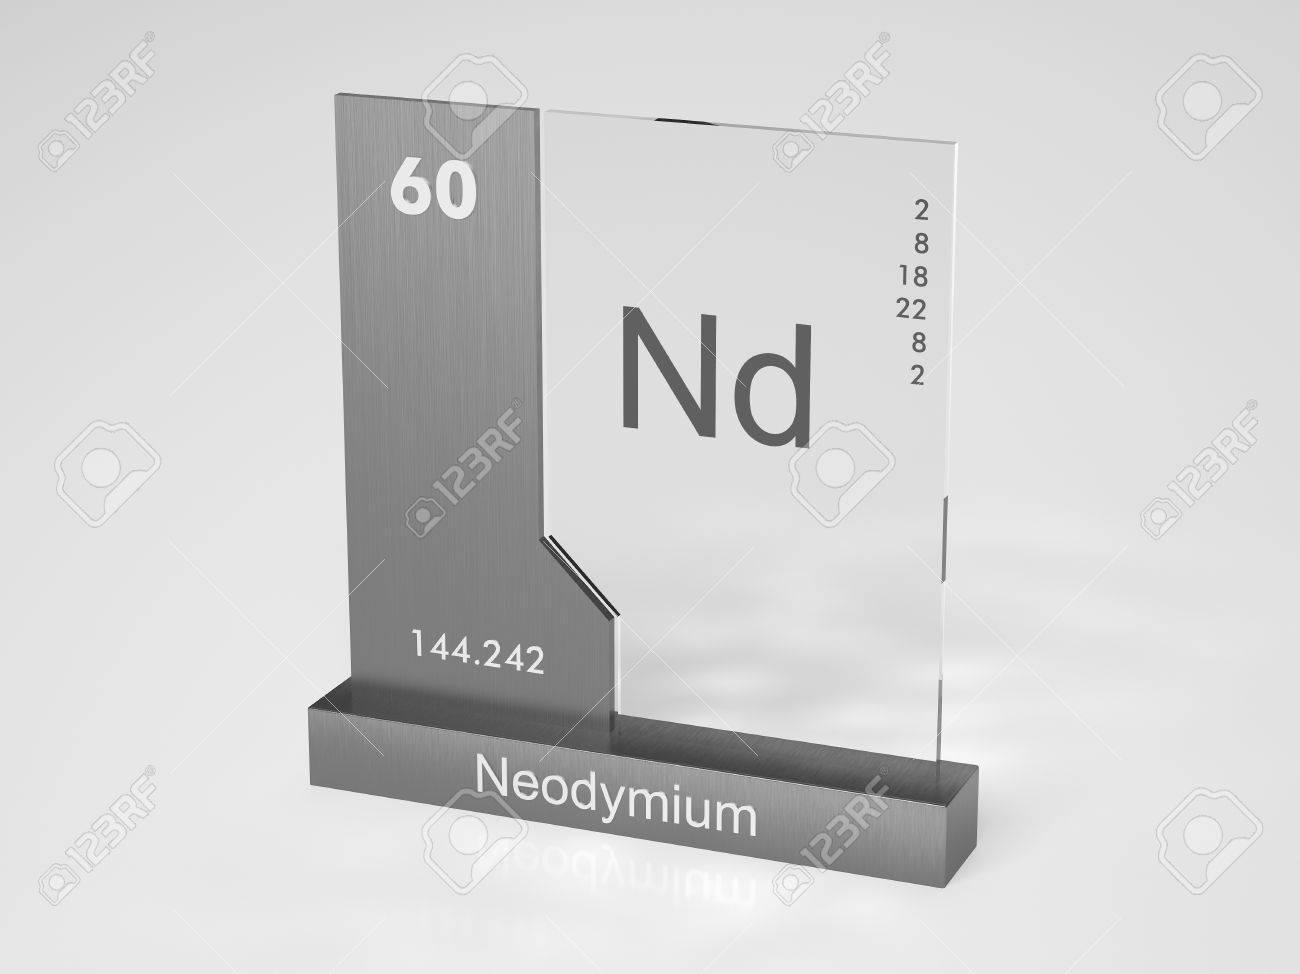 Neodymium symbol nd chemical element of the periodic table neodymium symbol nd chemical element of the periodic table stock photo 10469994 gamestrikefo Choice Image